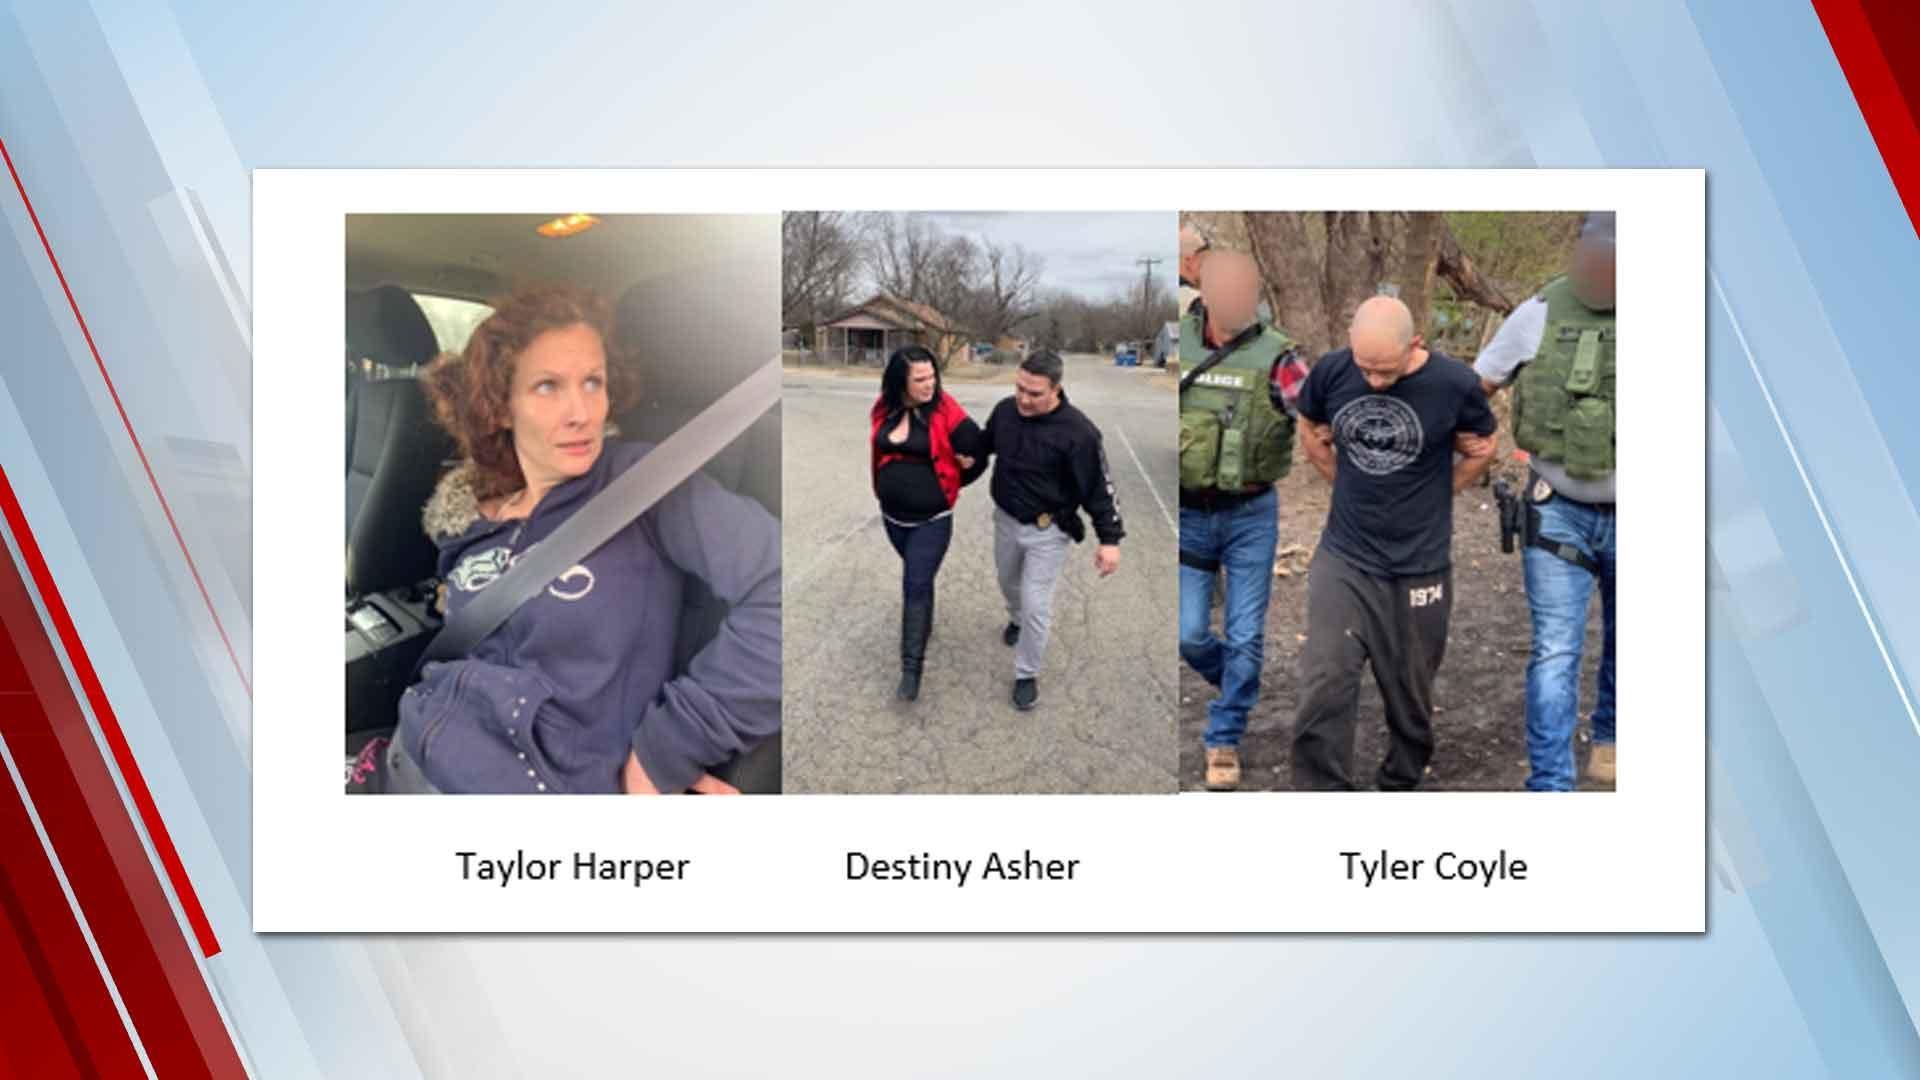 Tulsa Co. Deputies Arrest 3 In Connection To Murder Last Month